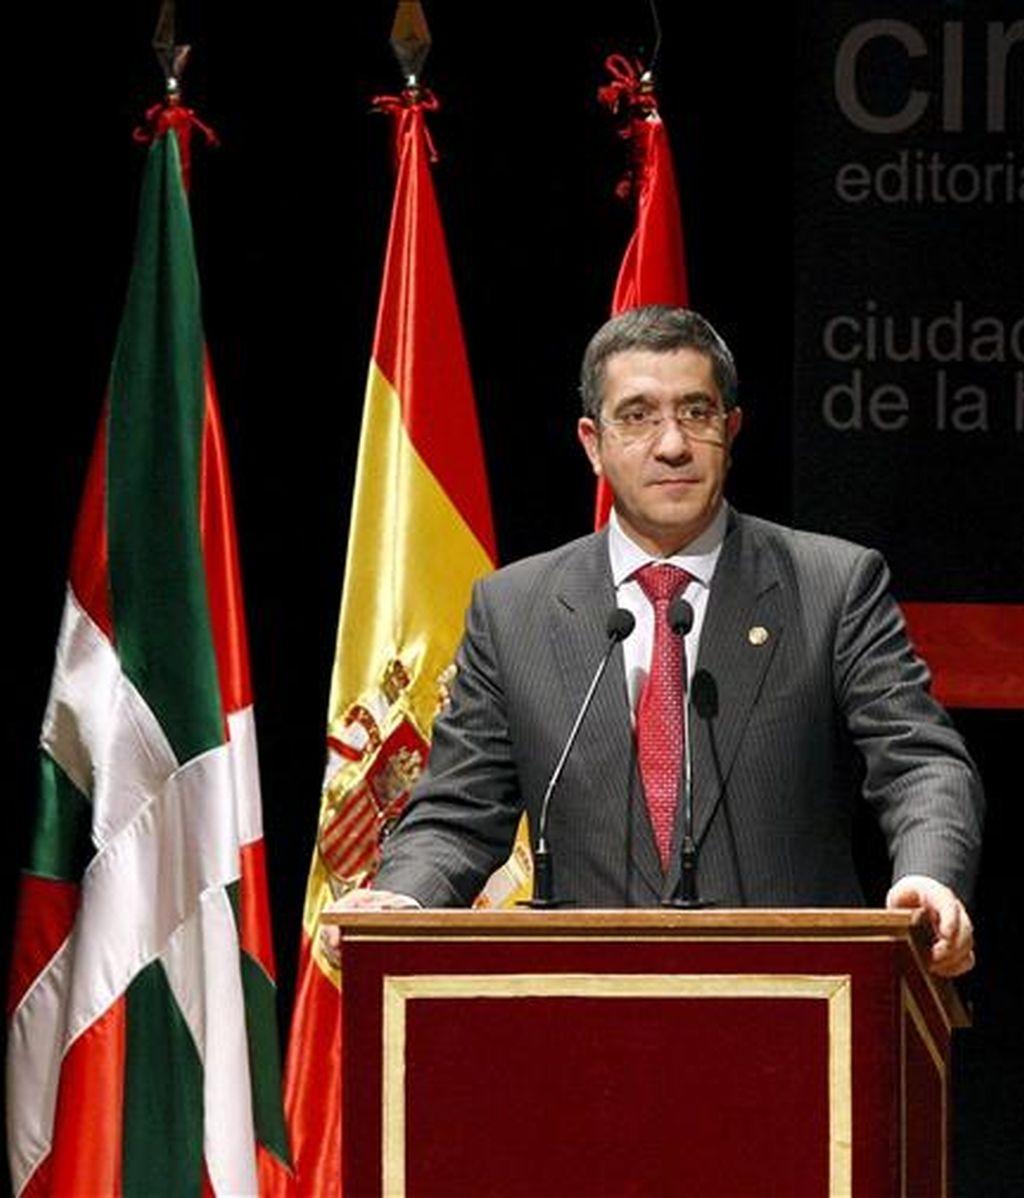 El lehendakari, Patxi López. EFE/Archivo